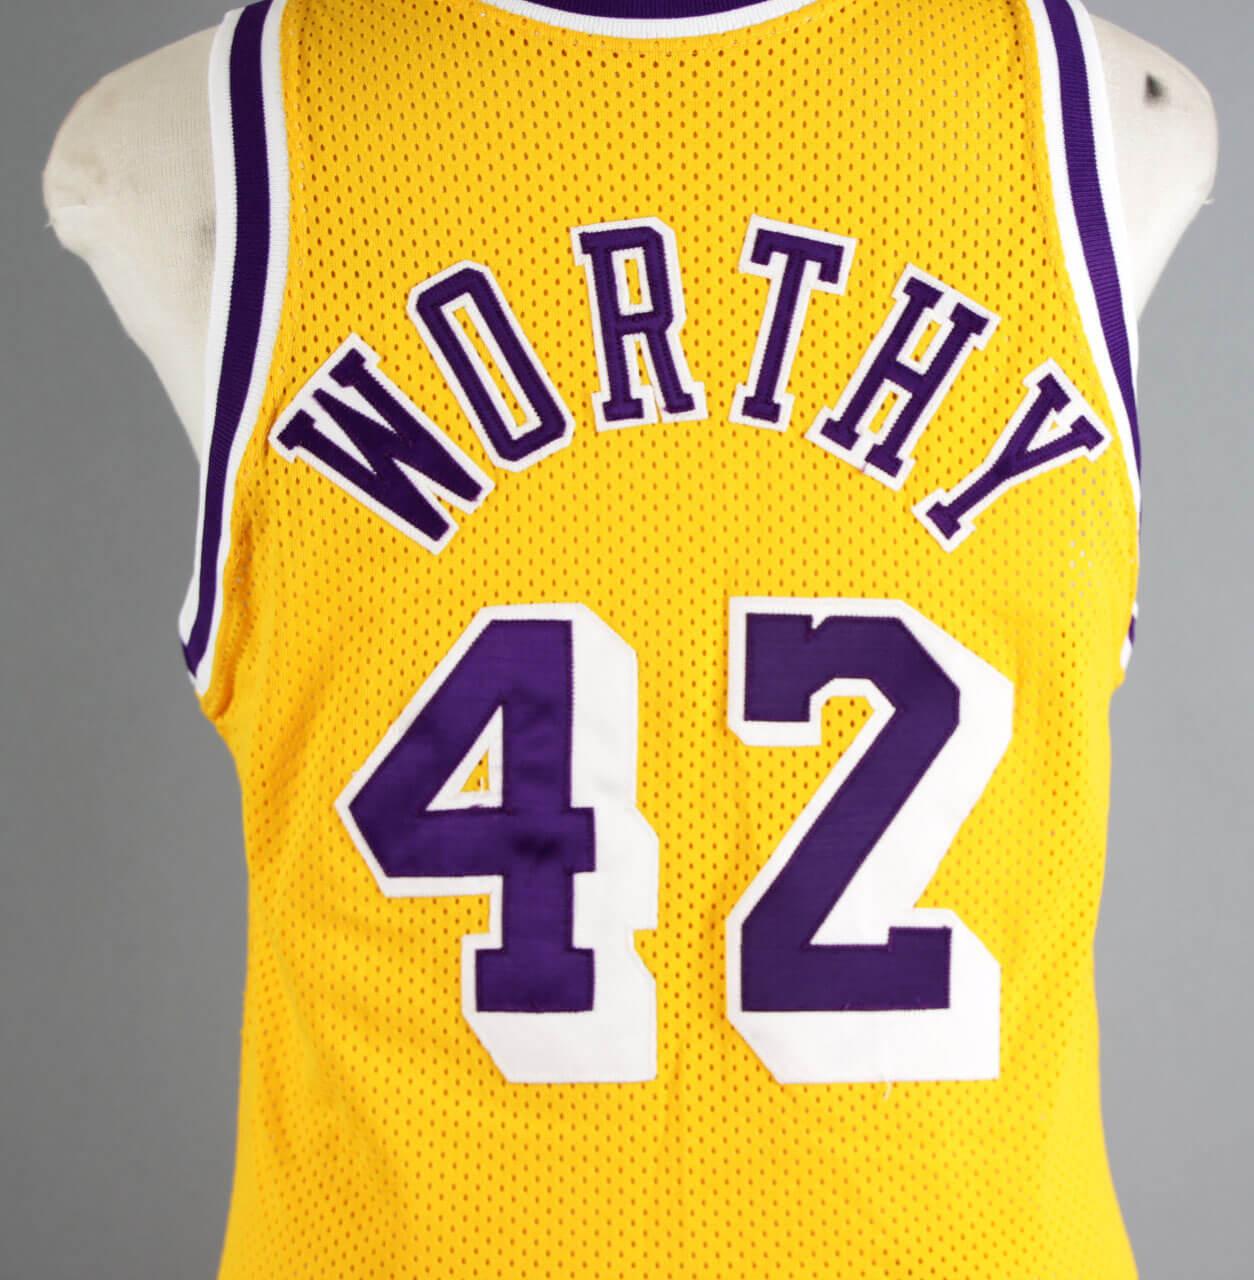 1989 James Worthy Game-Worn Los Angeles Lakers Jersey – COA 100% Team 2db163bdd